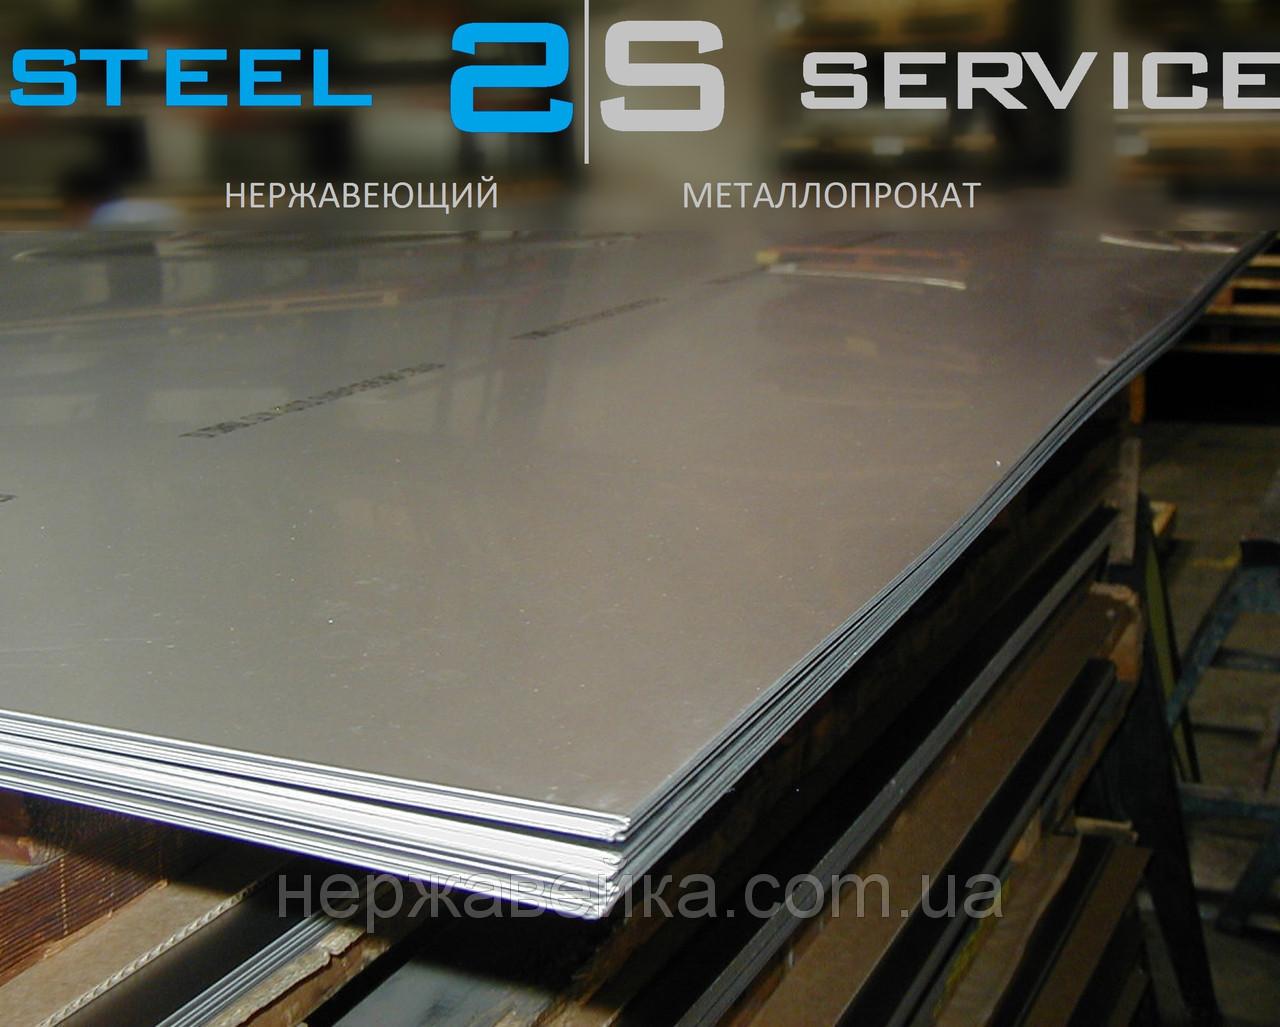 Нержавейка лист 4х1000х2000мм AISI 430(12Х17) 2B - матовый, технический